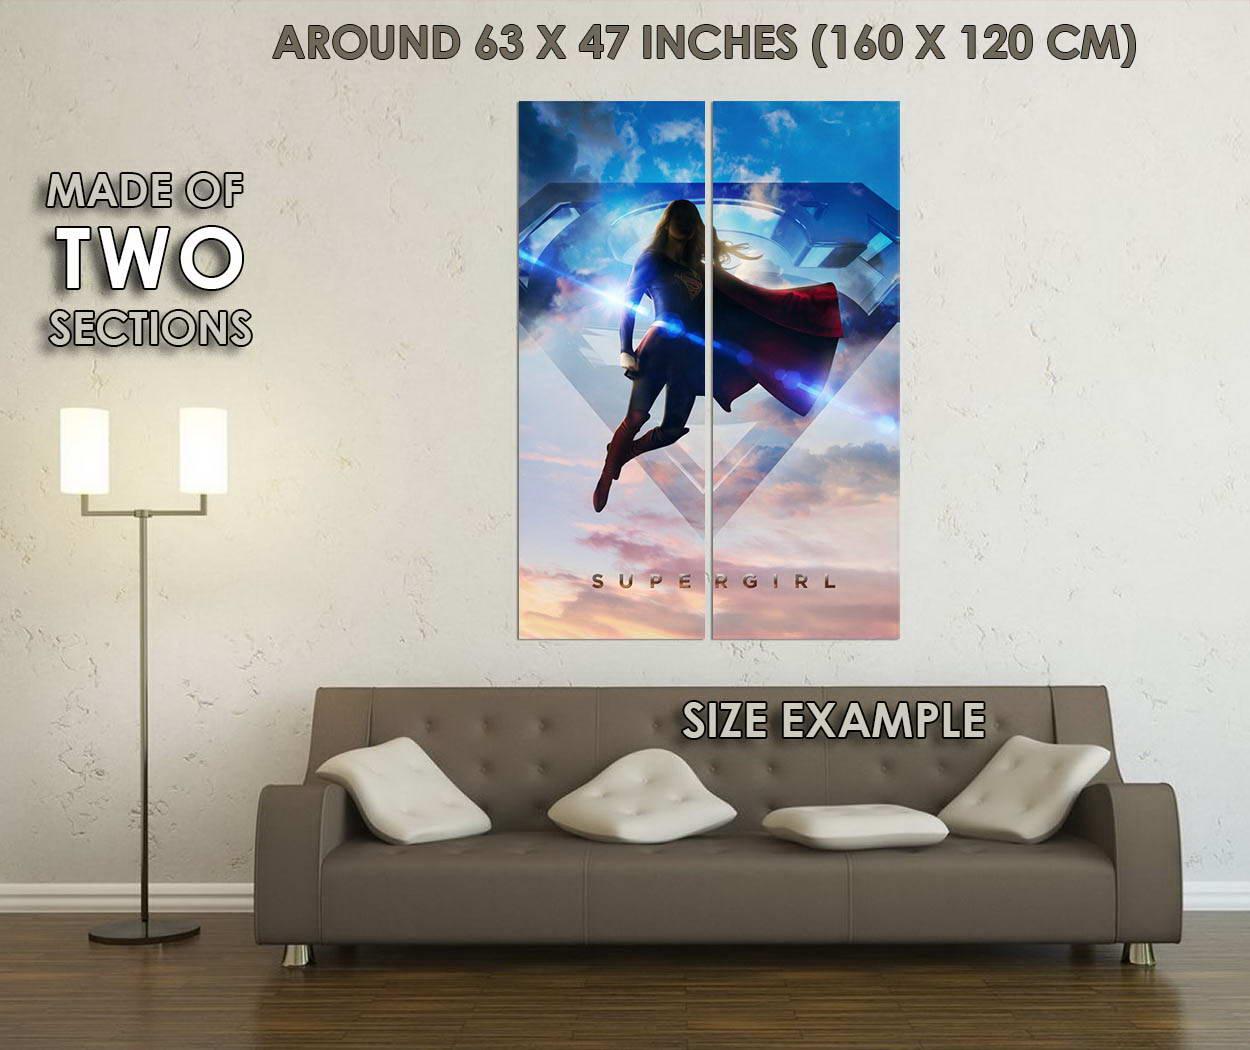 10096-Supergirl-TV-Series-Superheroes-LAMINATED-POSTER-CA thumbnail 6